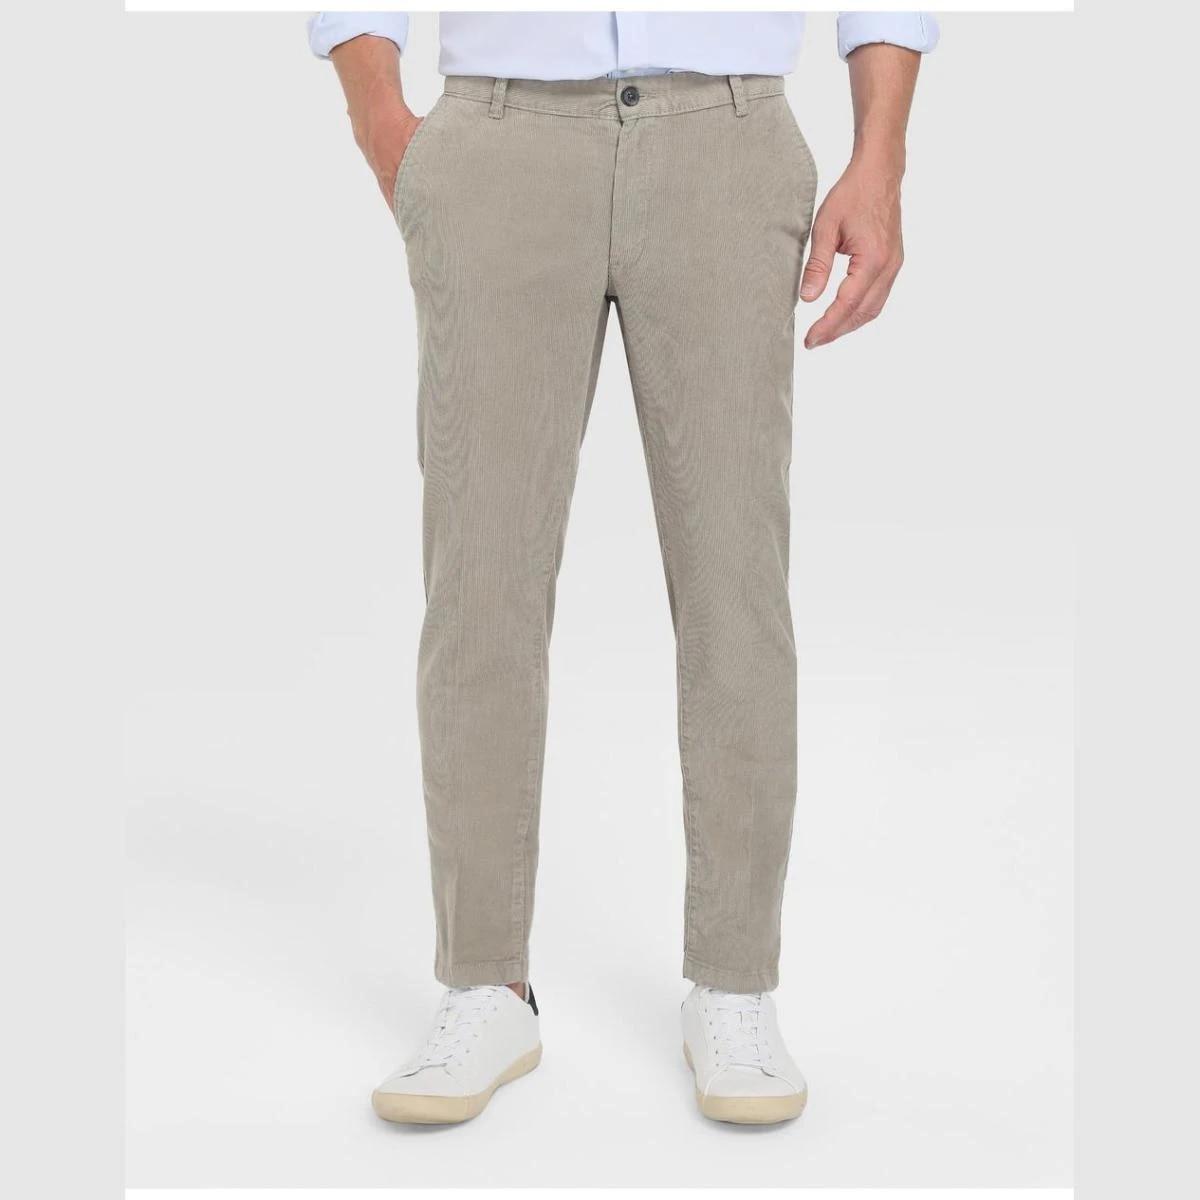 Unit Hombre Sintetico Pantalones Pantalon Chino Basico Unit Hombre De Pana Aliexpress